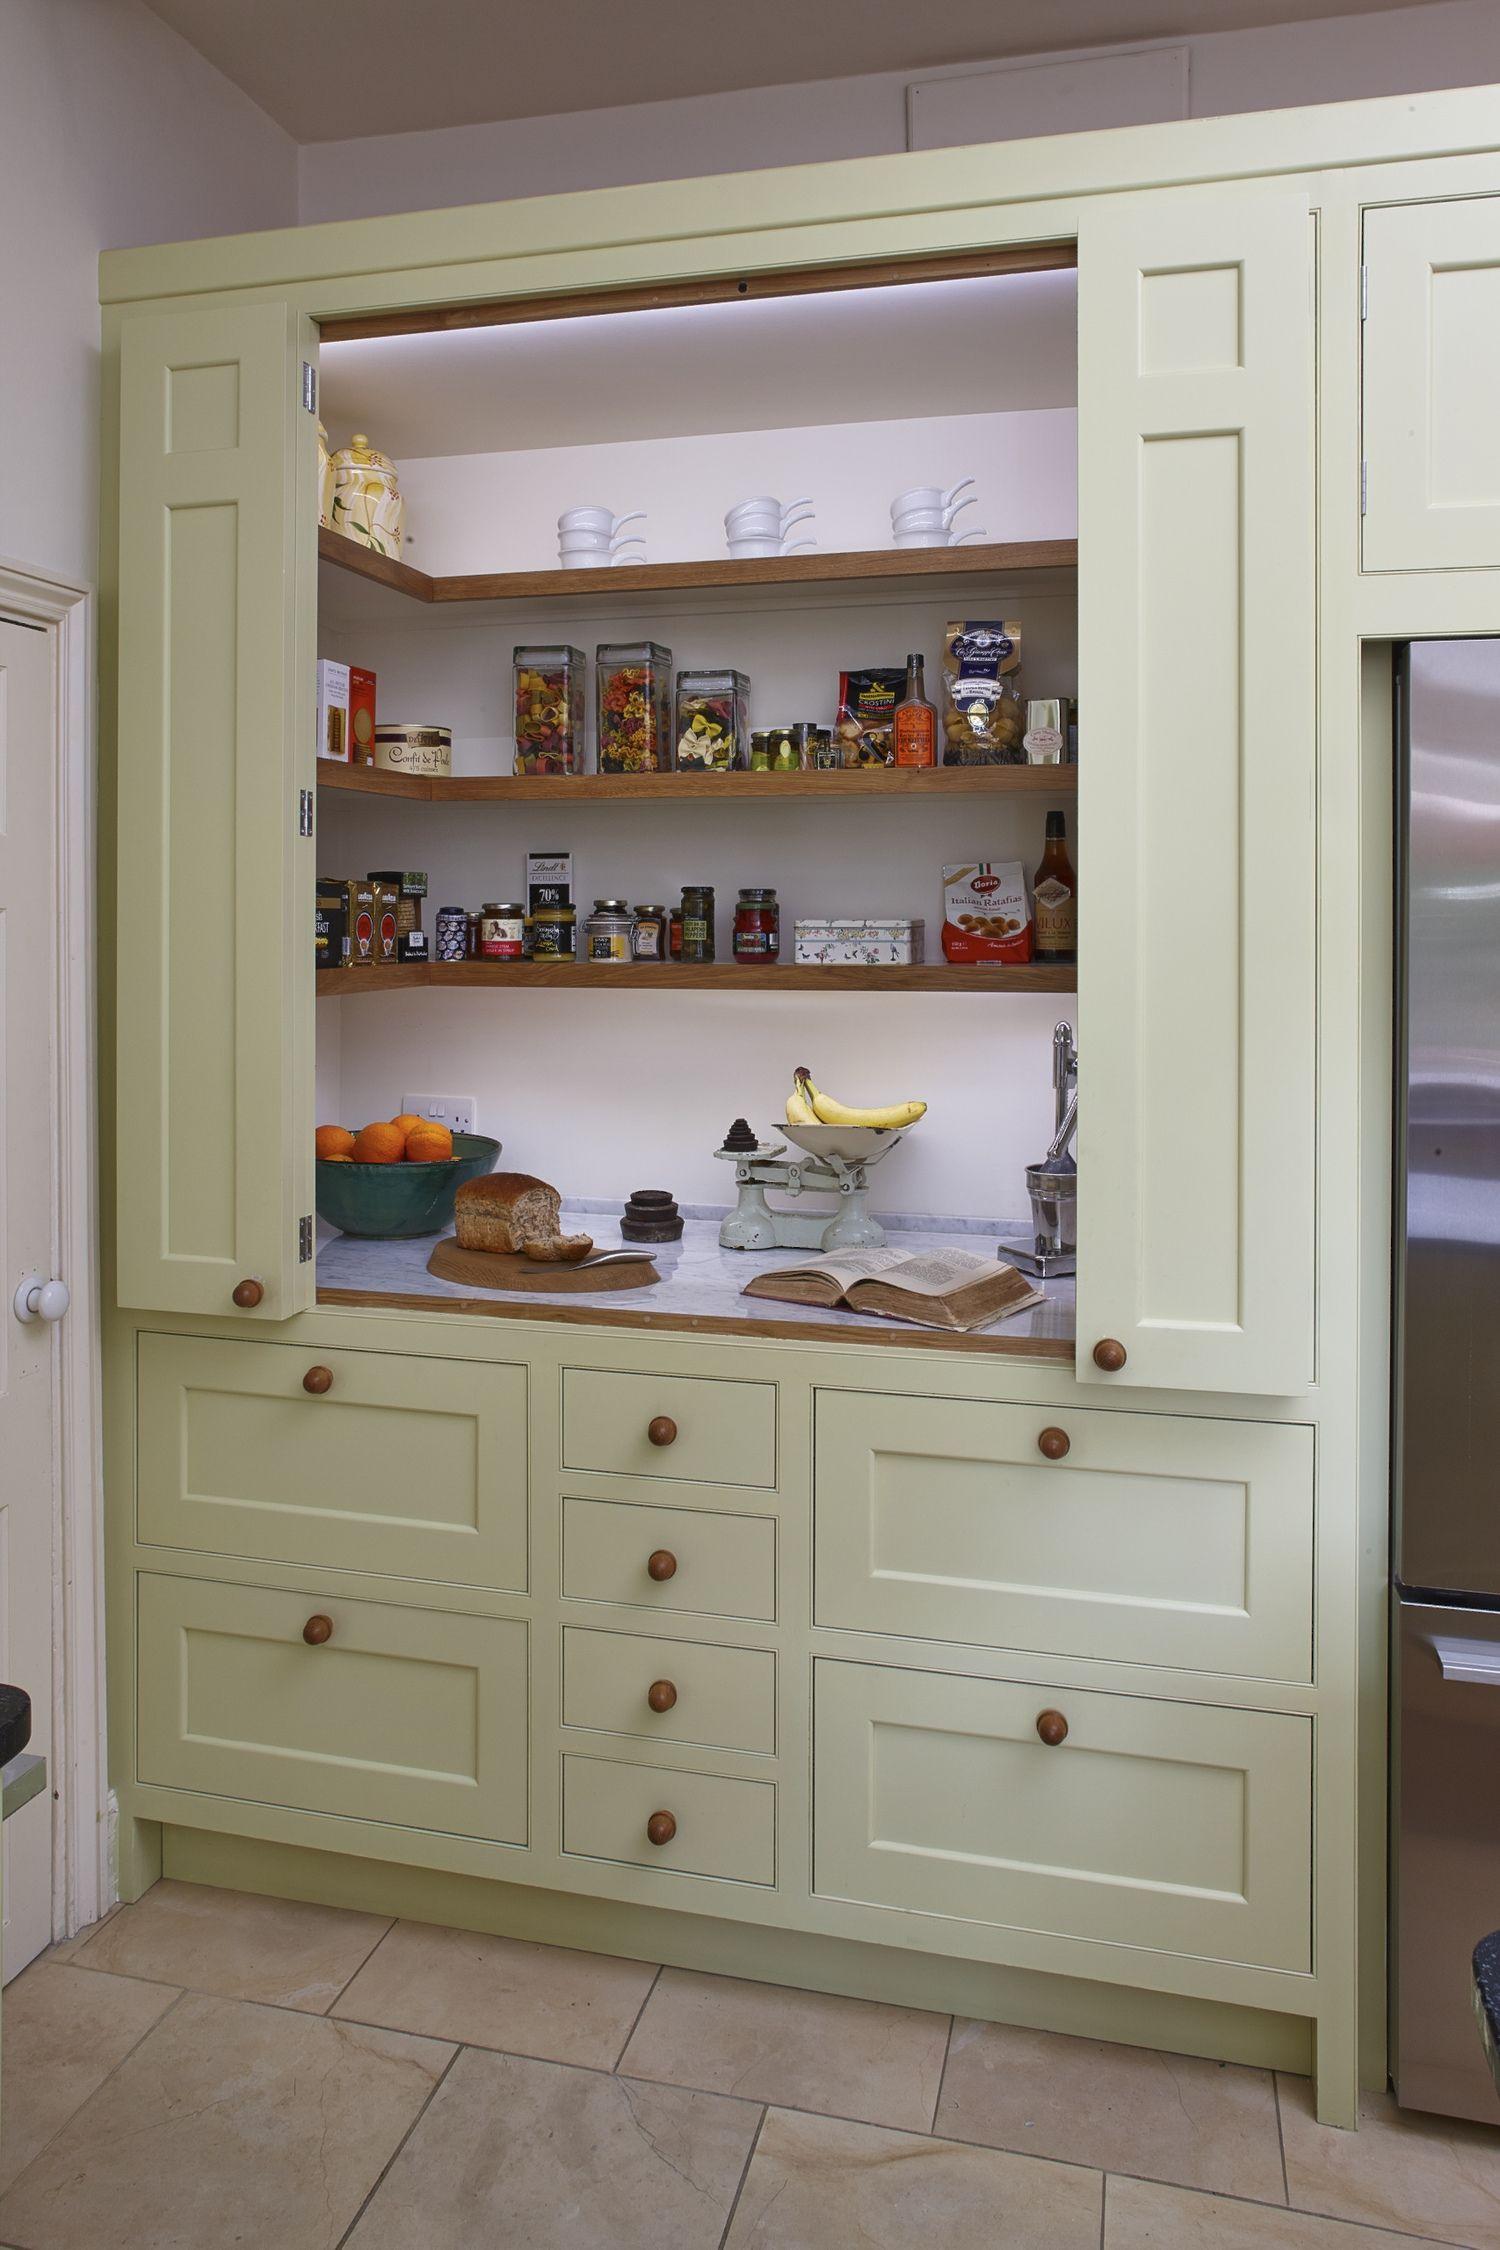 Traditional Kitchen And Larder Bi Folding Doors Kitchen Kitchen Design Kitchen Pantry Design